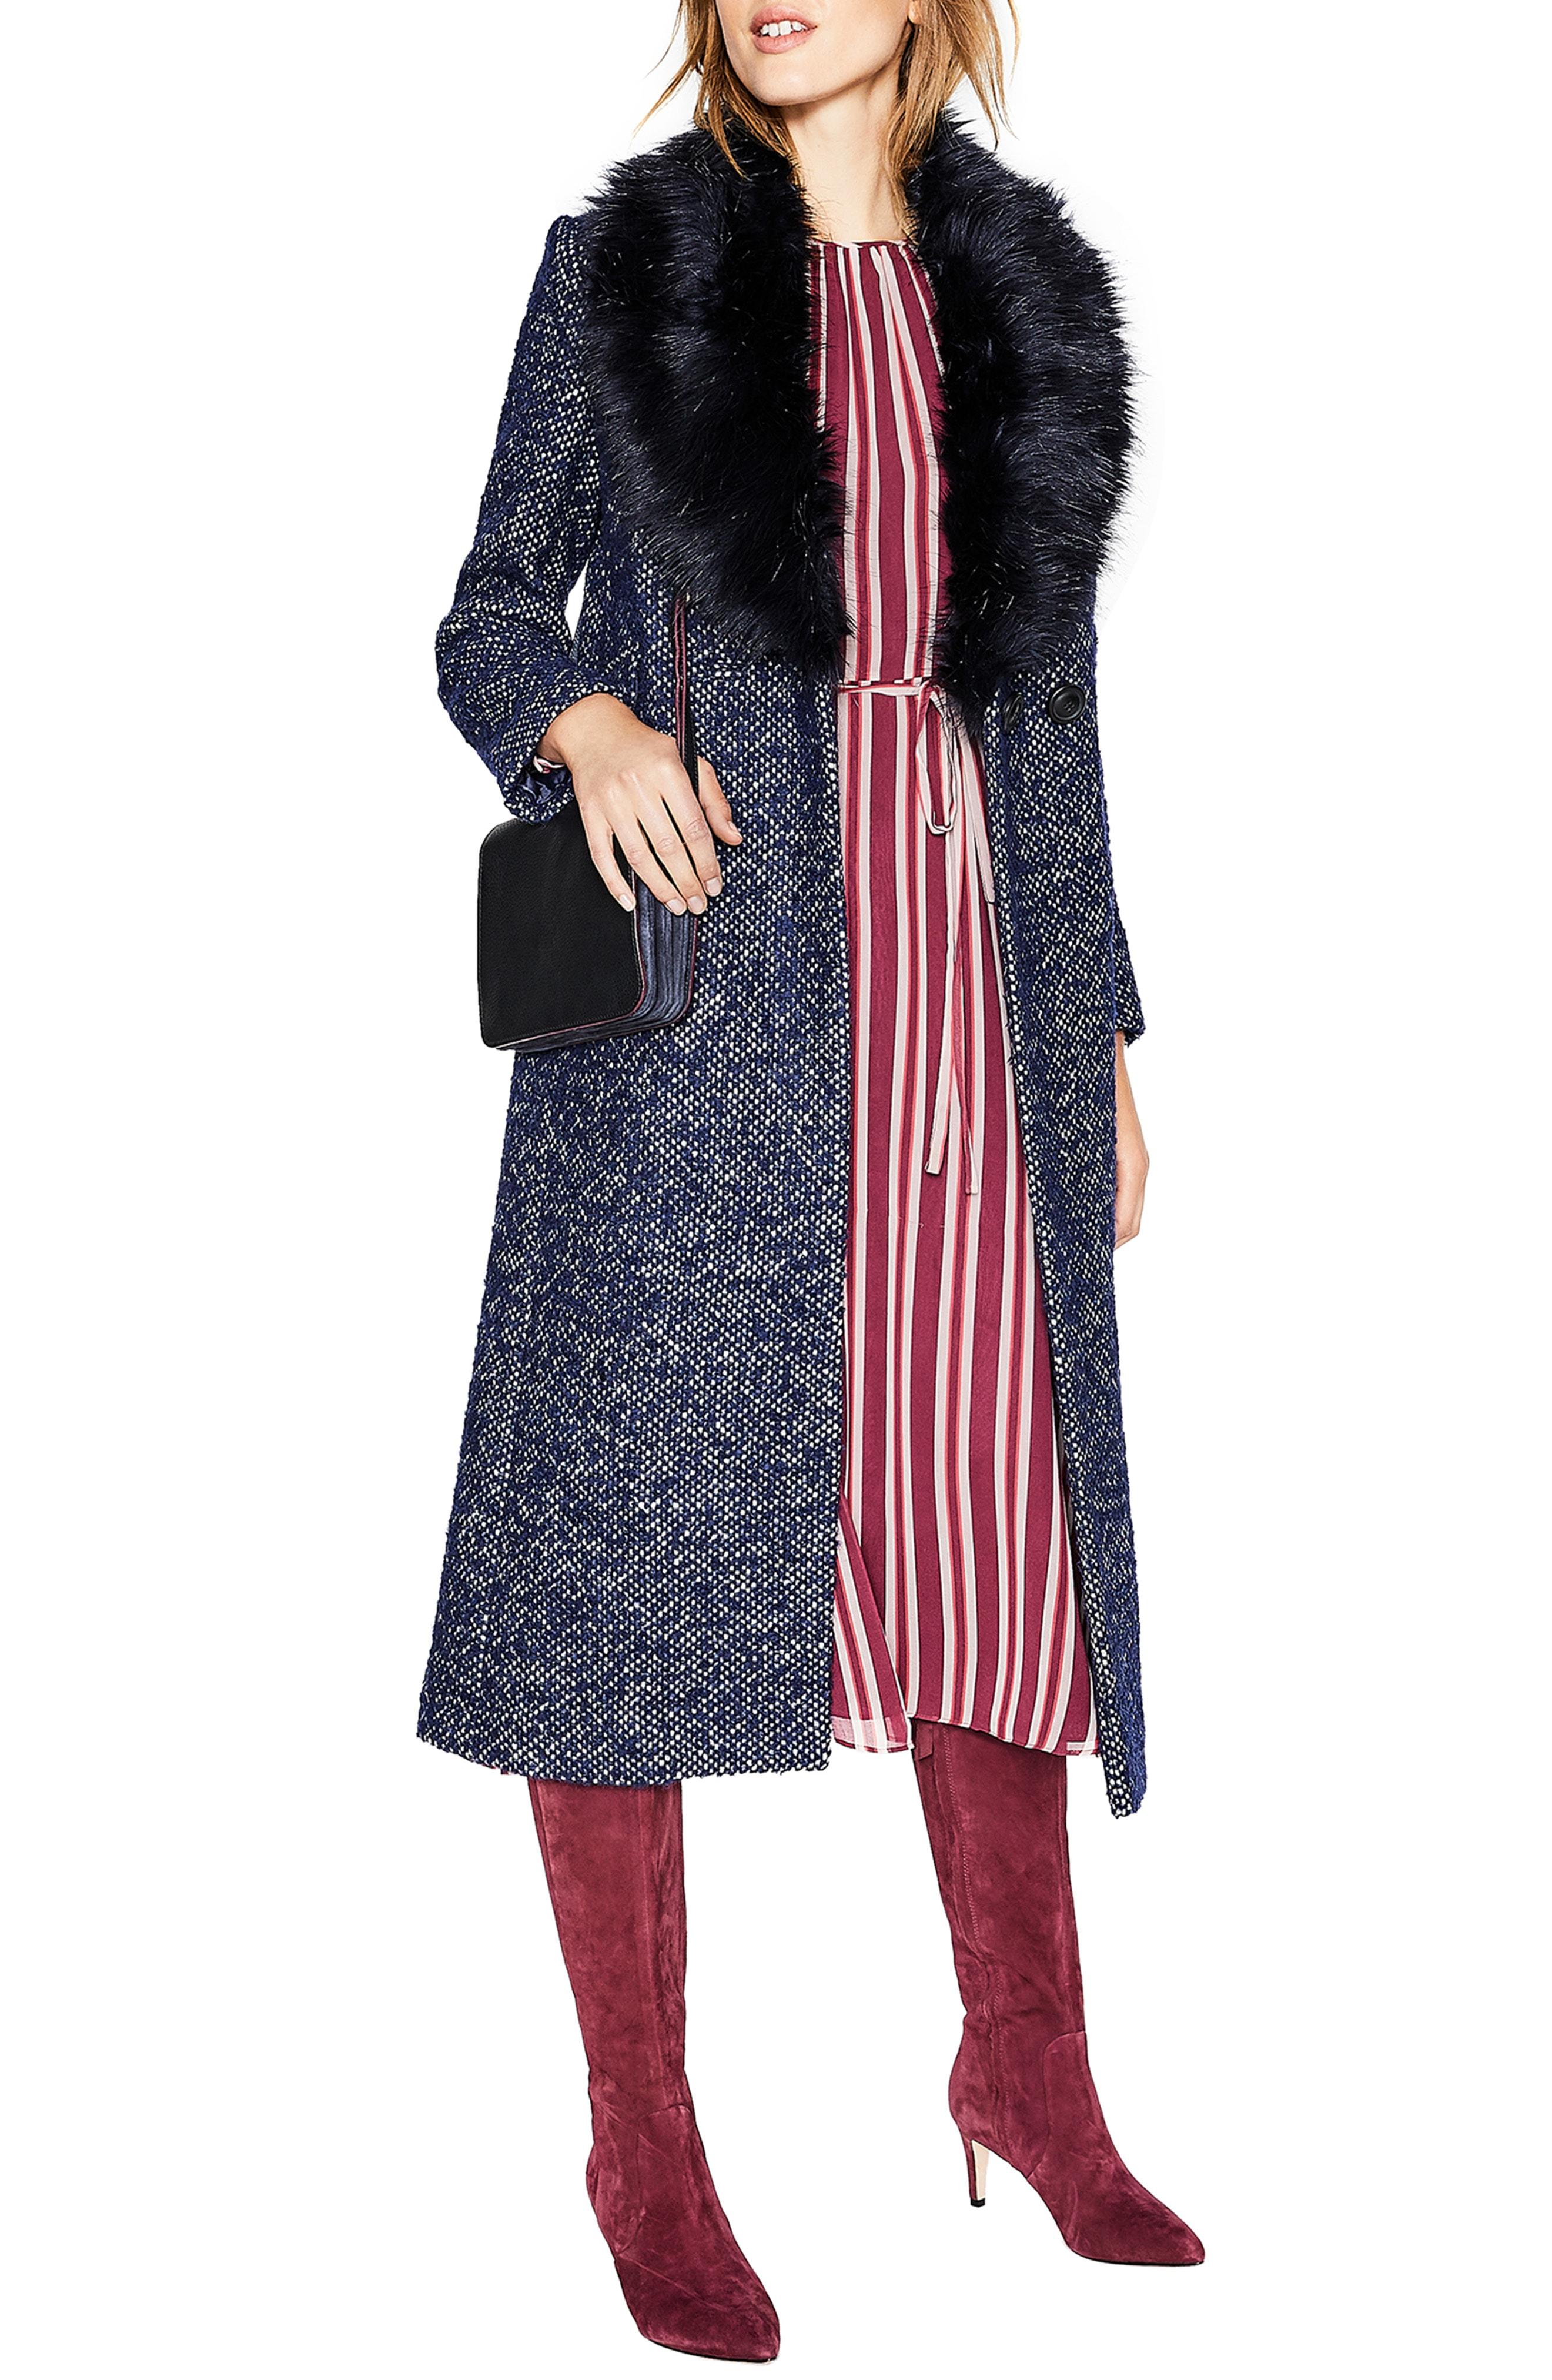 Boden Burley Removable Faux Fur Collar Tweed Coat